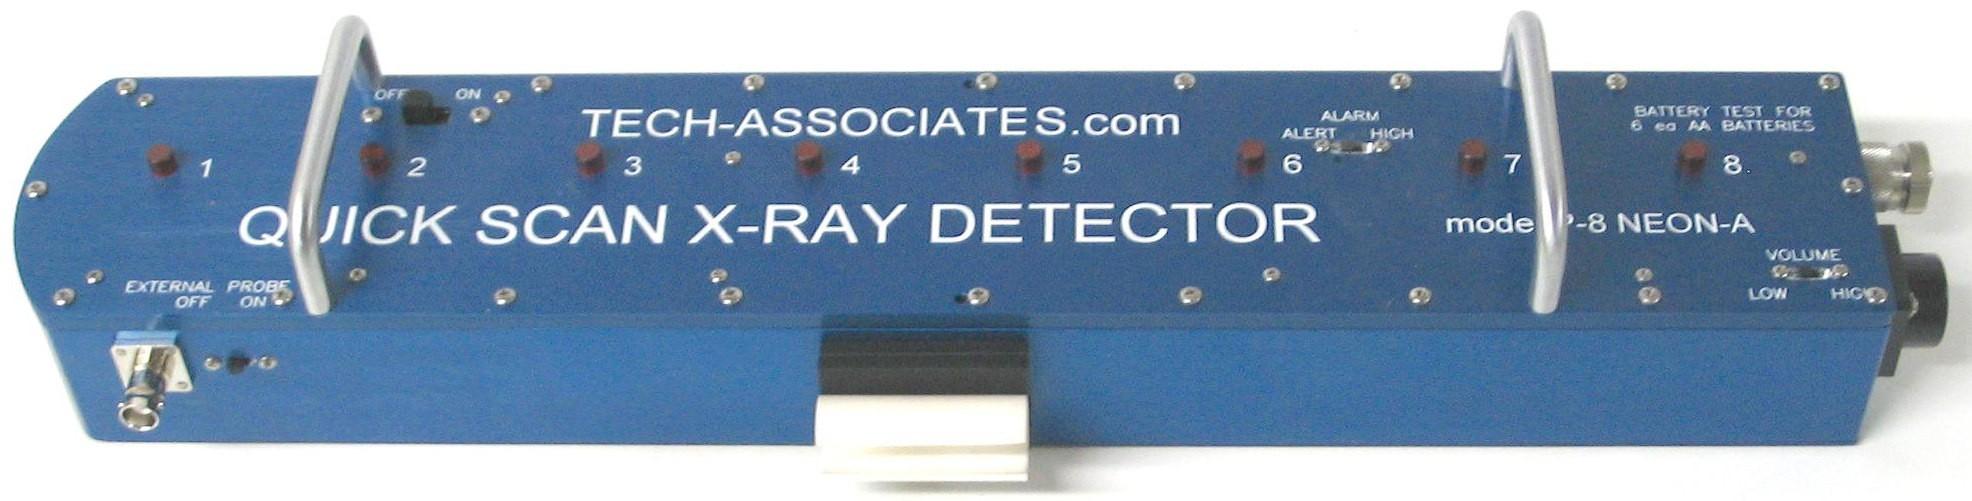 X-Ray Monitors